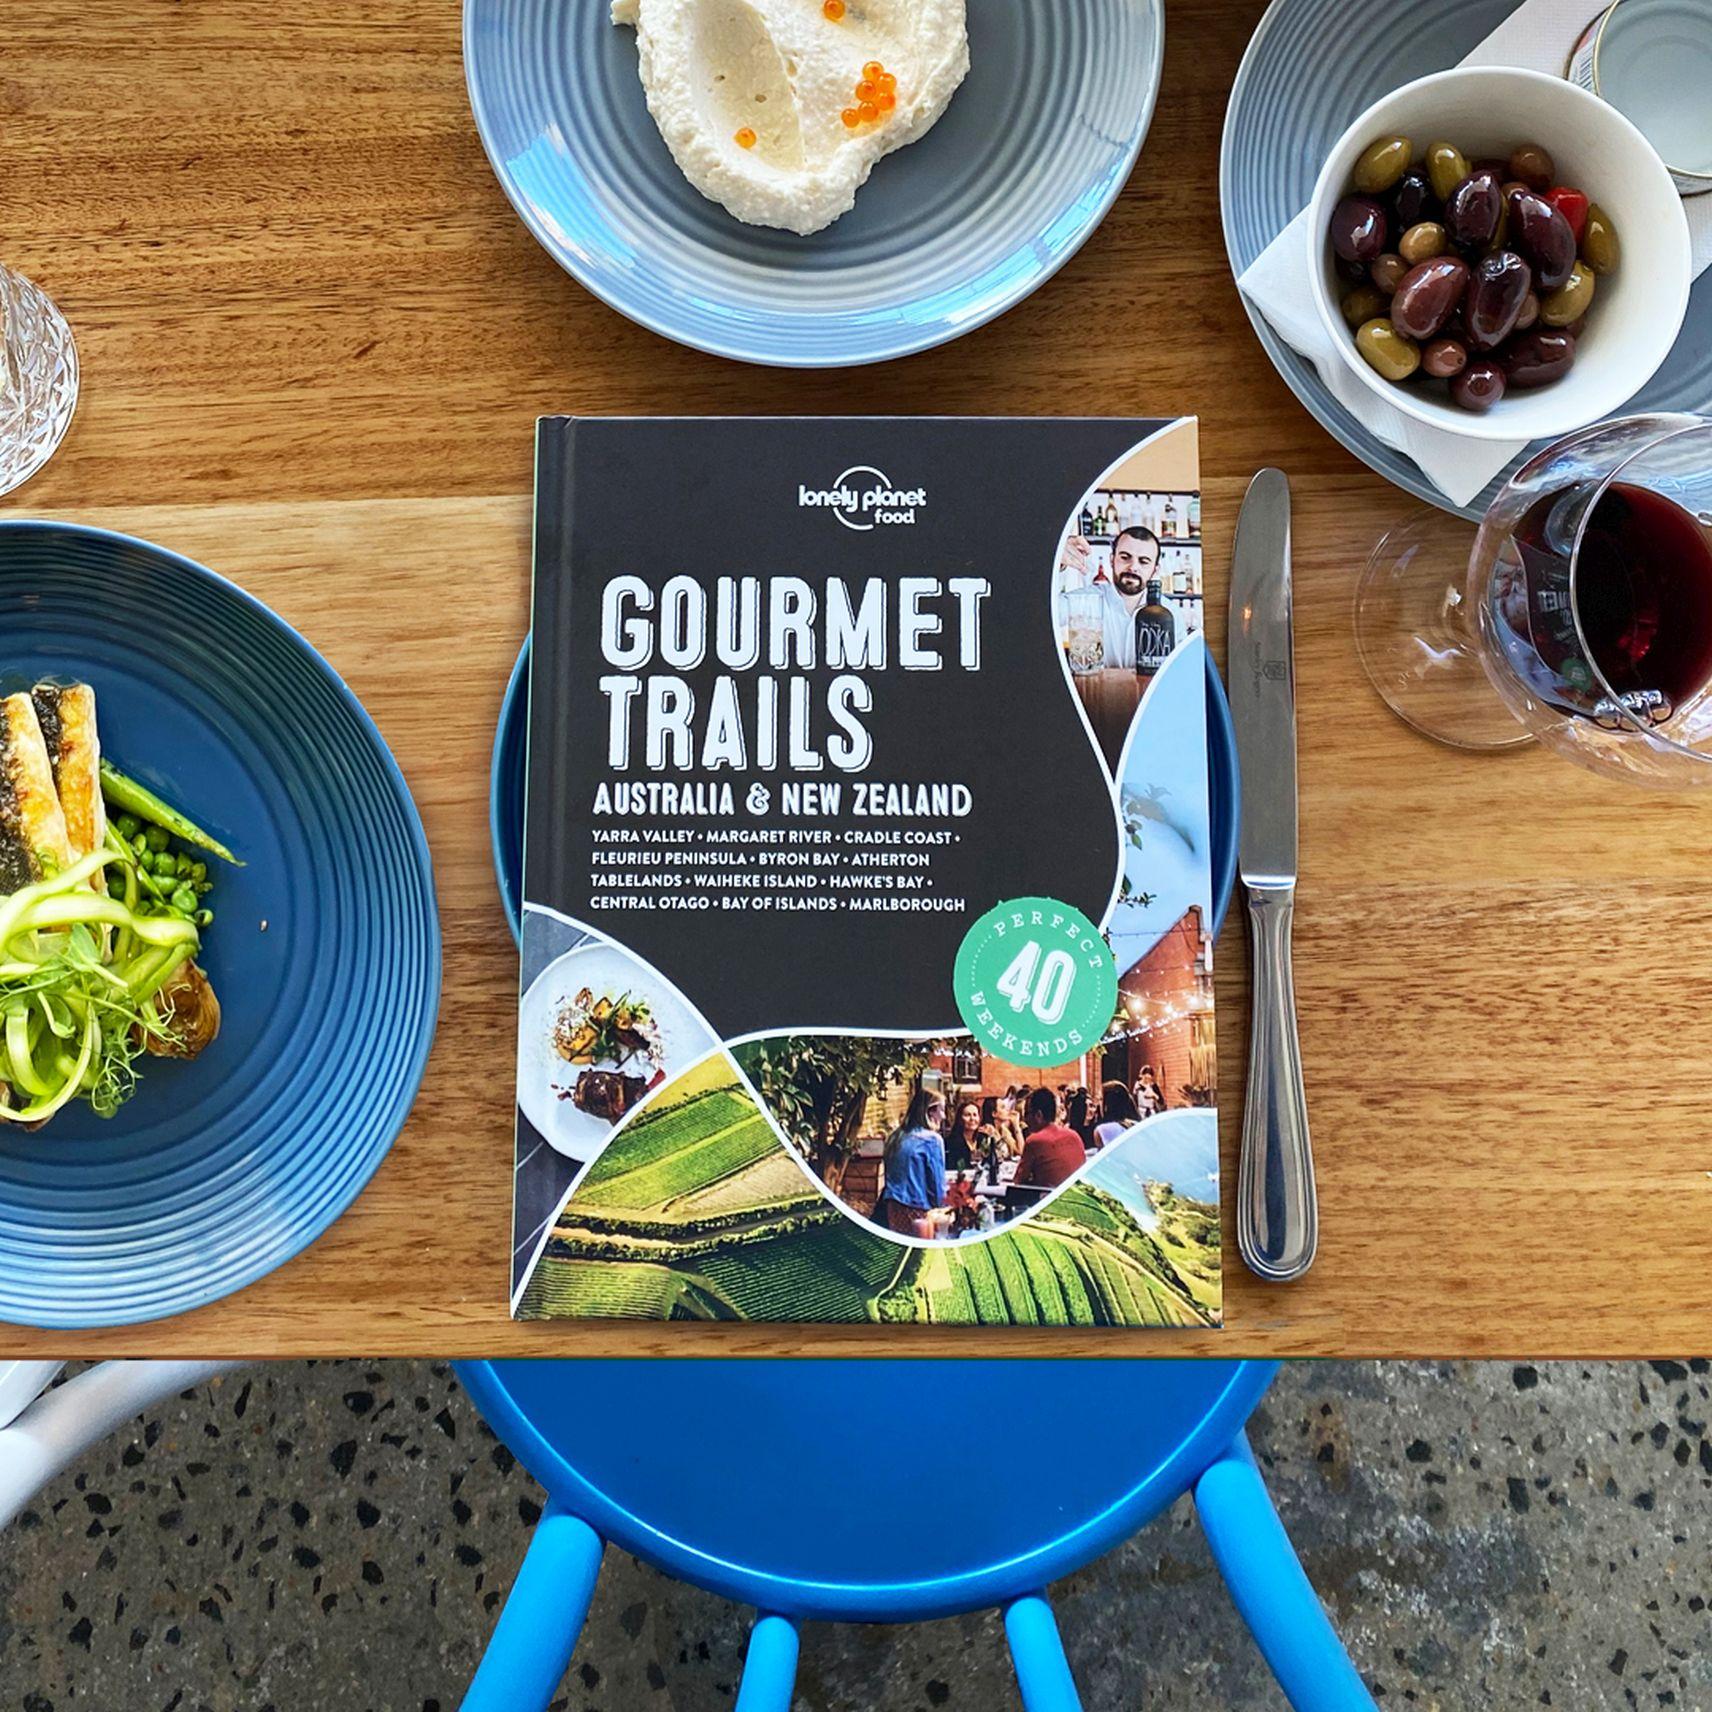 Gourmet Trails in Oz & NZ